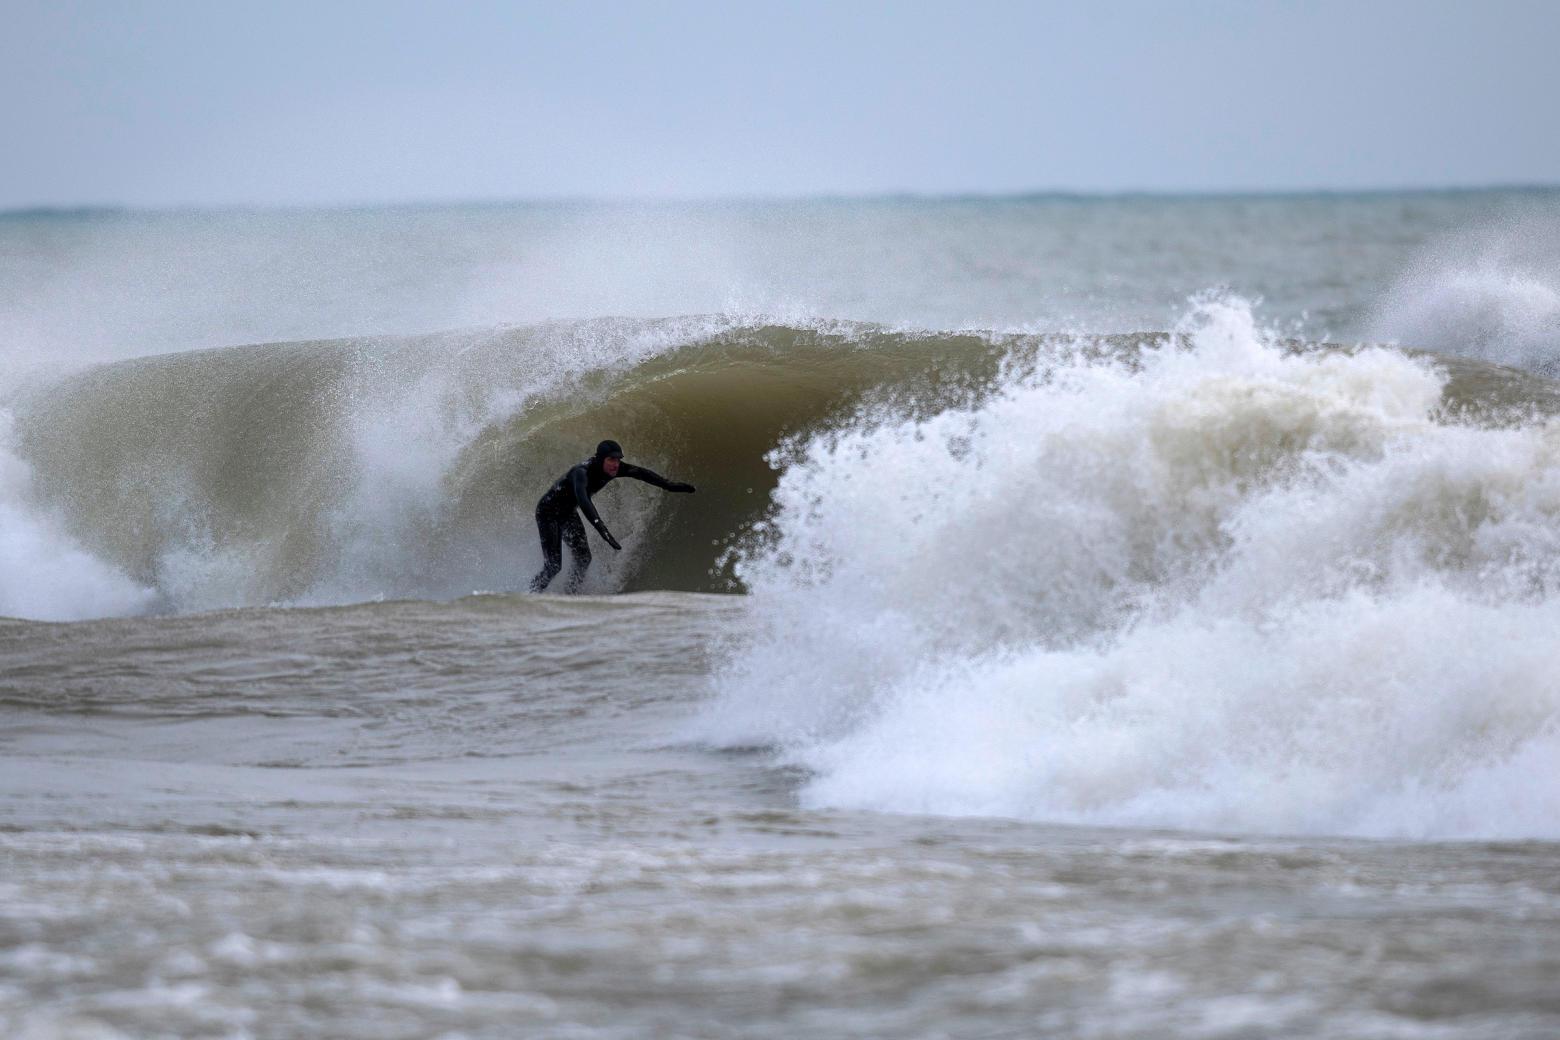 Finding Surf in Sheboygan, Wisconsin